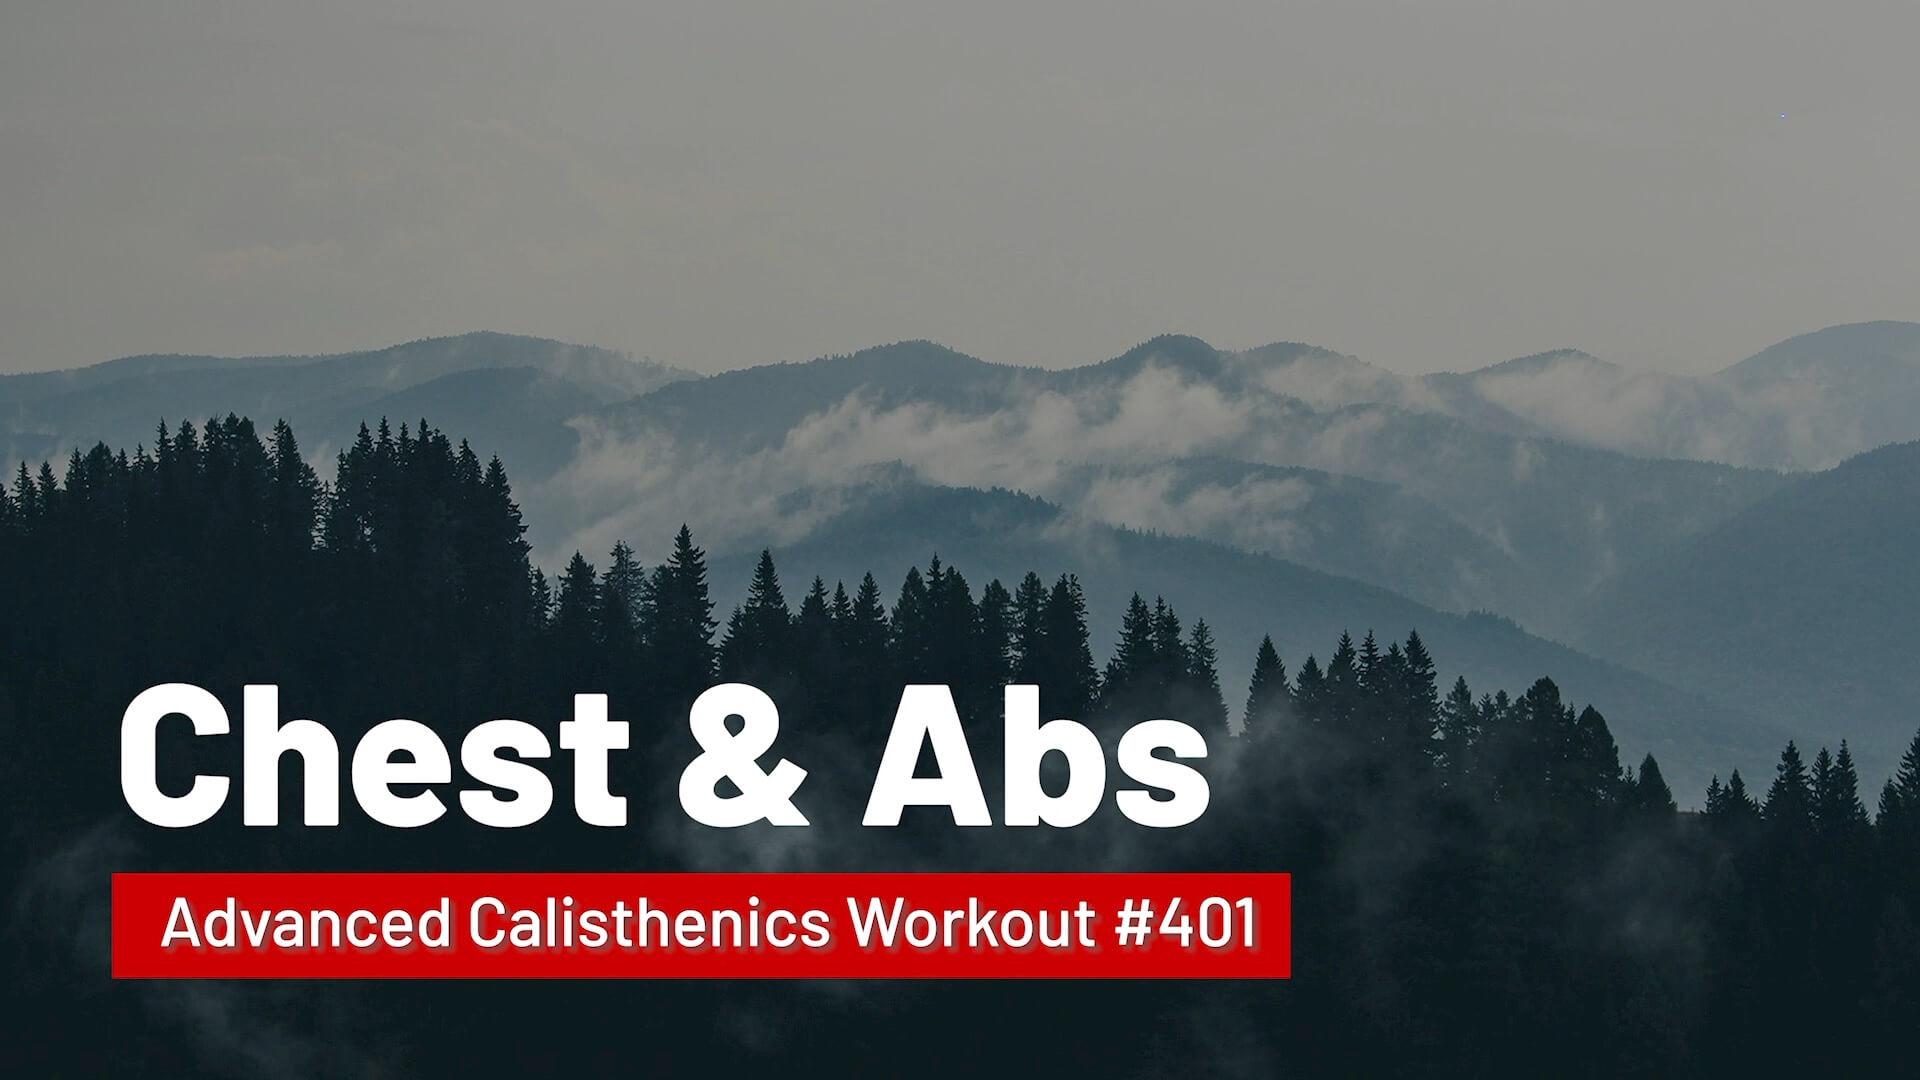 Workout #401